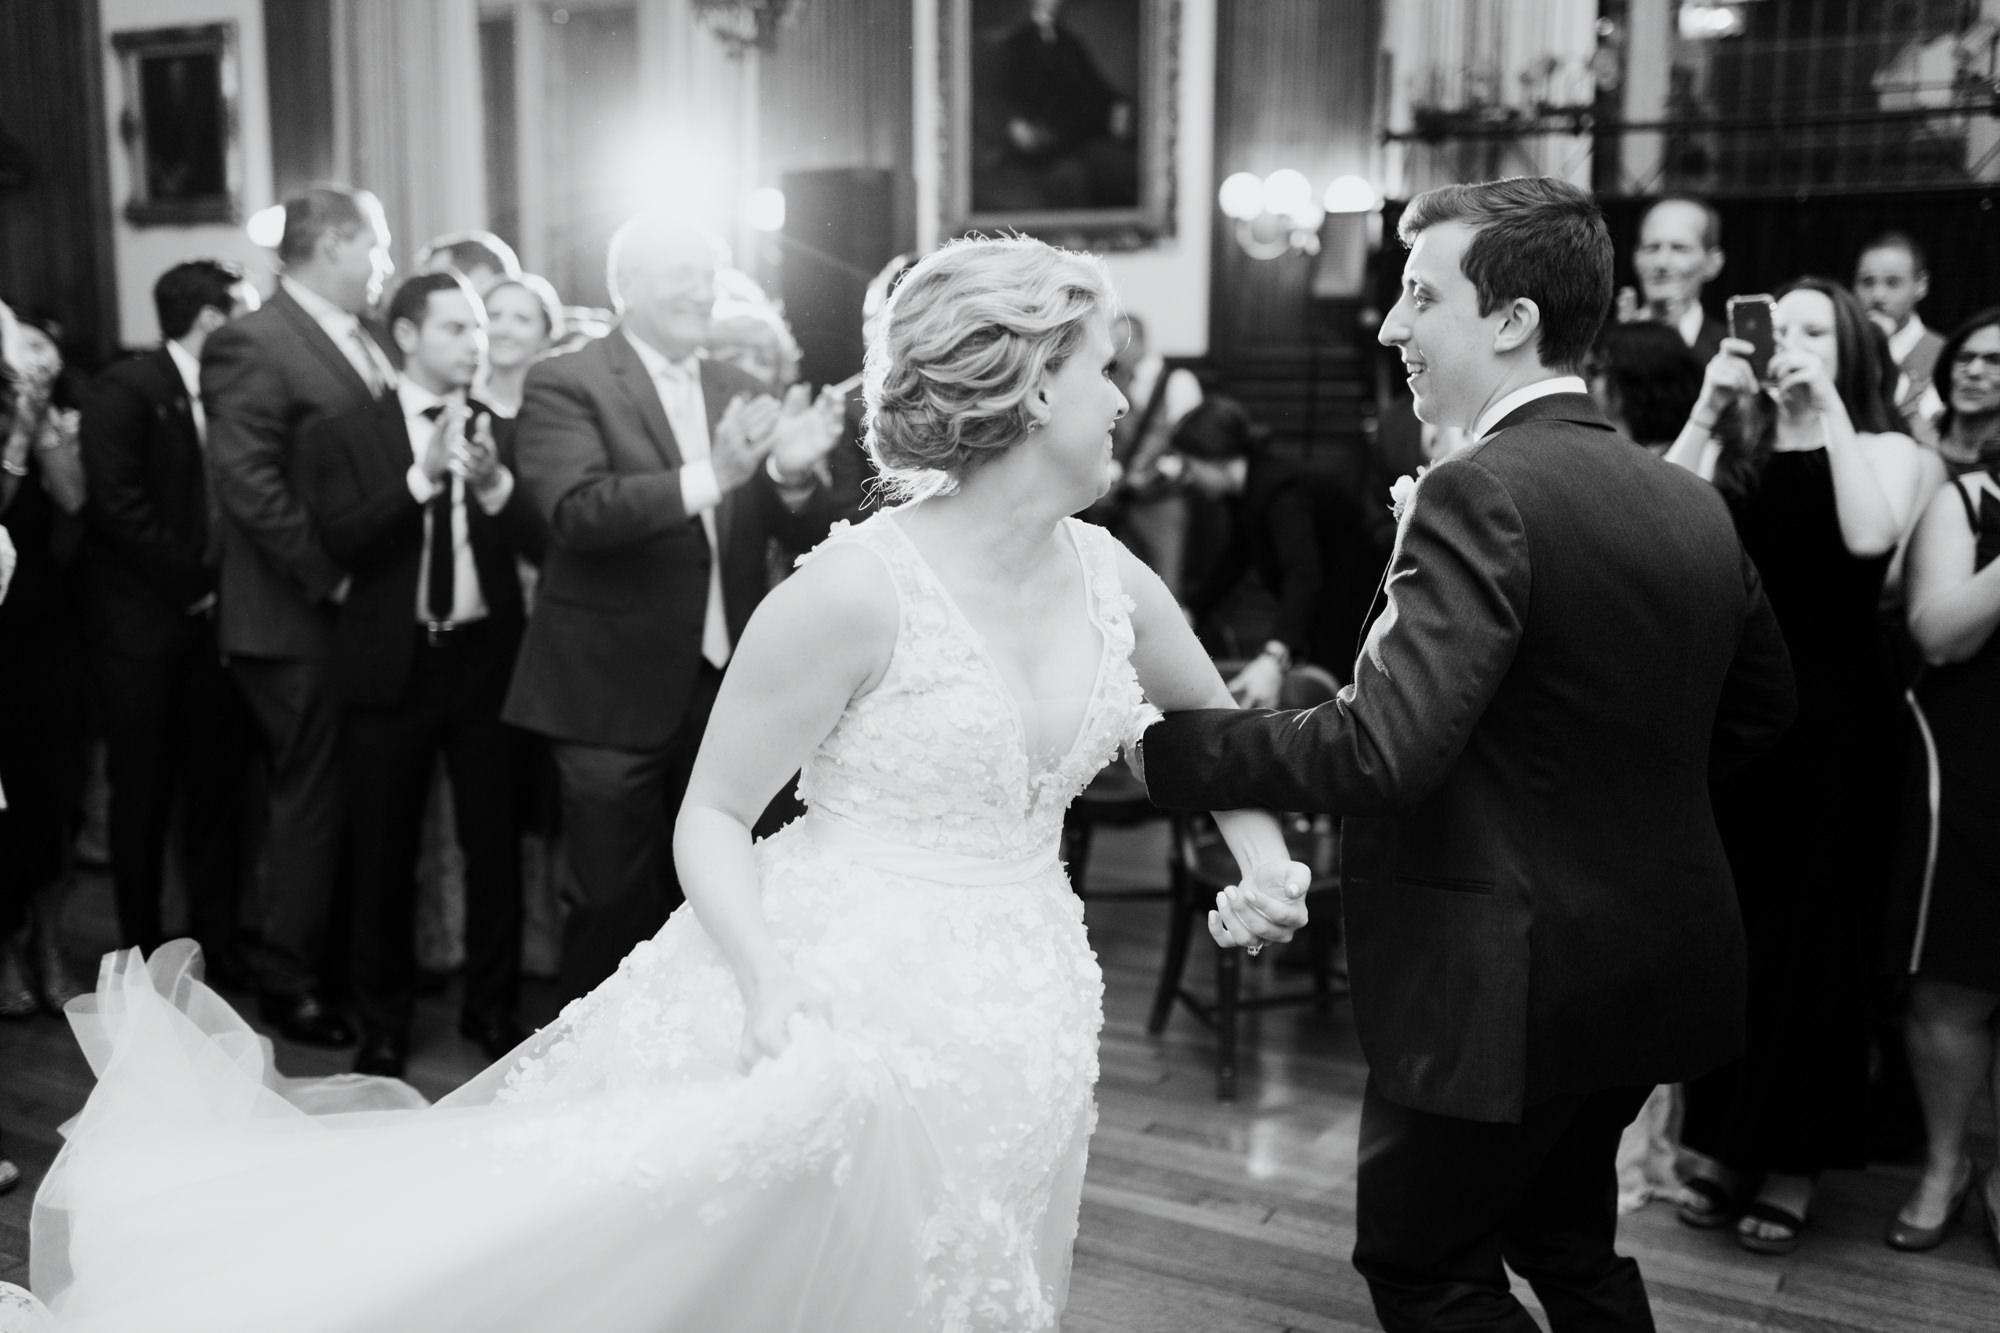 haley-richter-photography-autumn-college-of-physicians-wedding-philadelphia--322.jpg